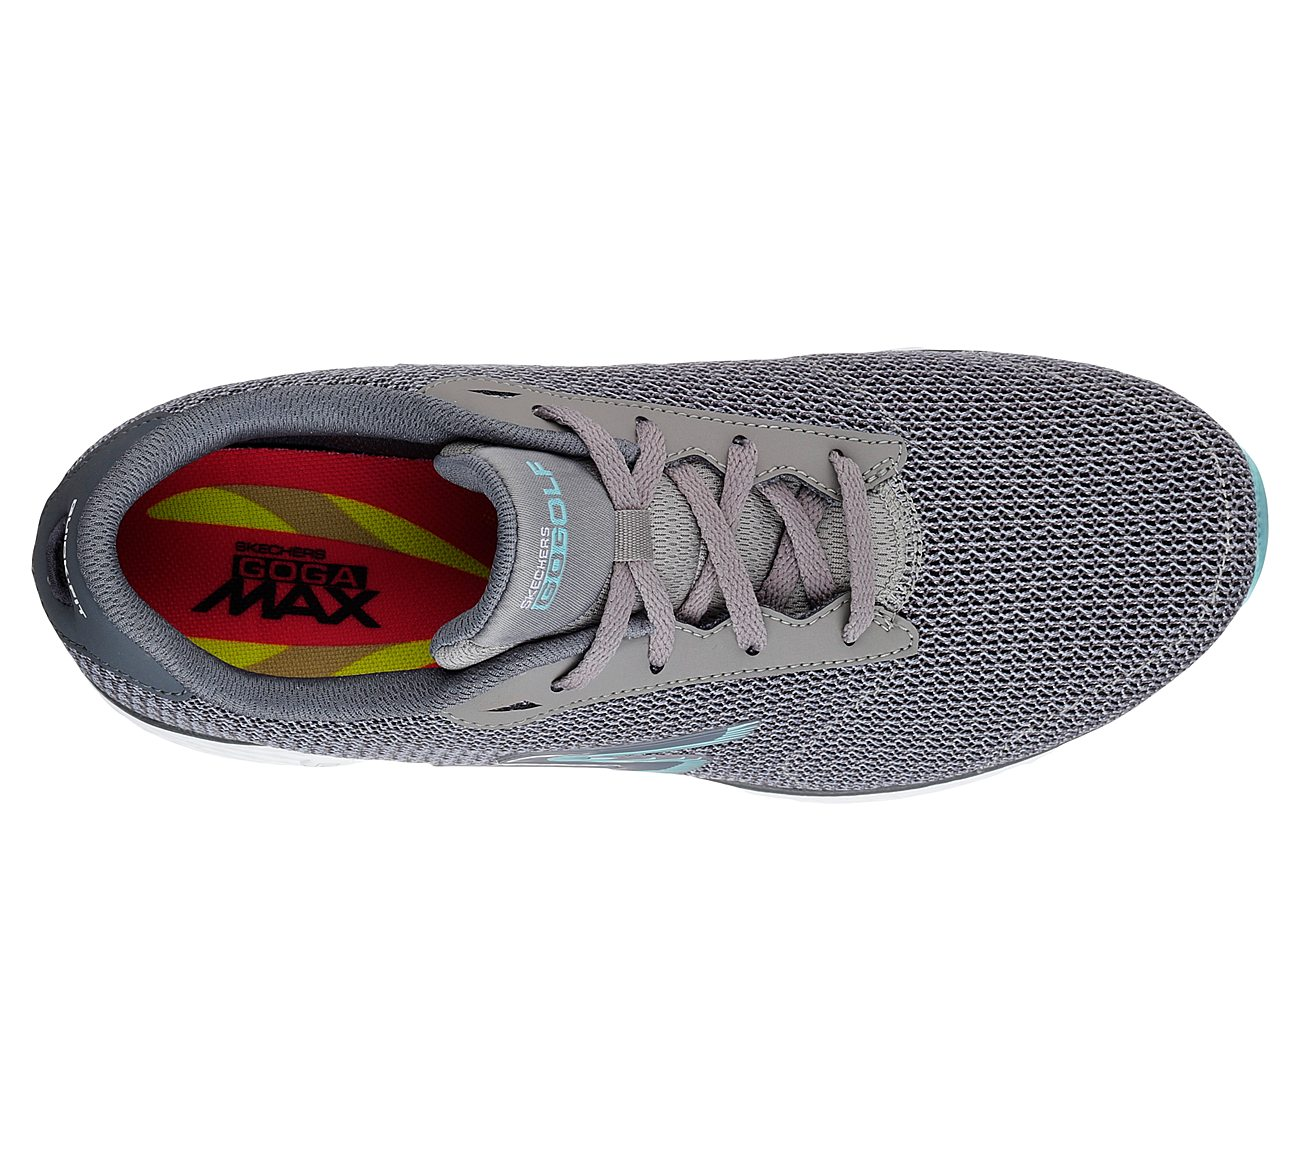 Skechers Go Golf Eagle Range Golf Shoe - Grey/Blue